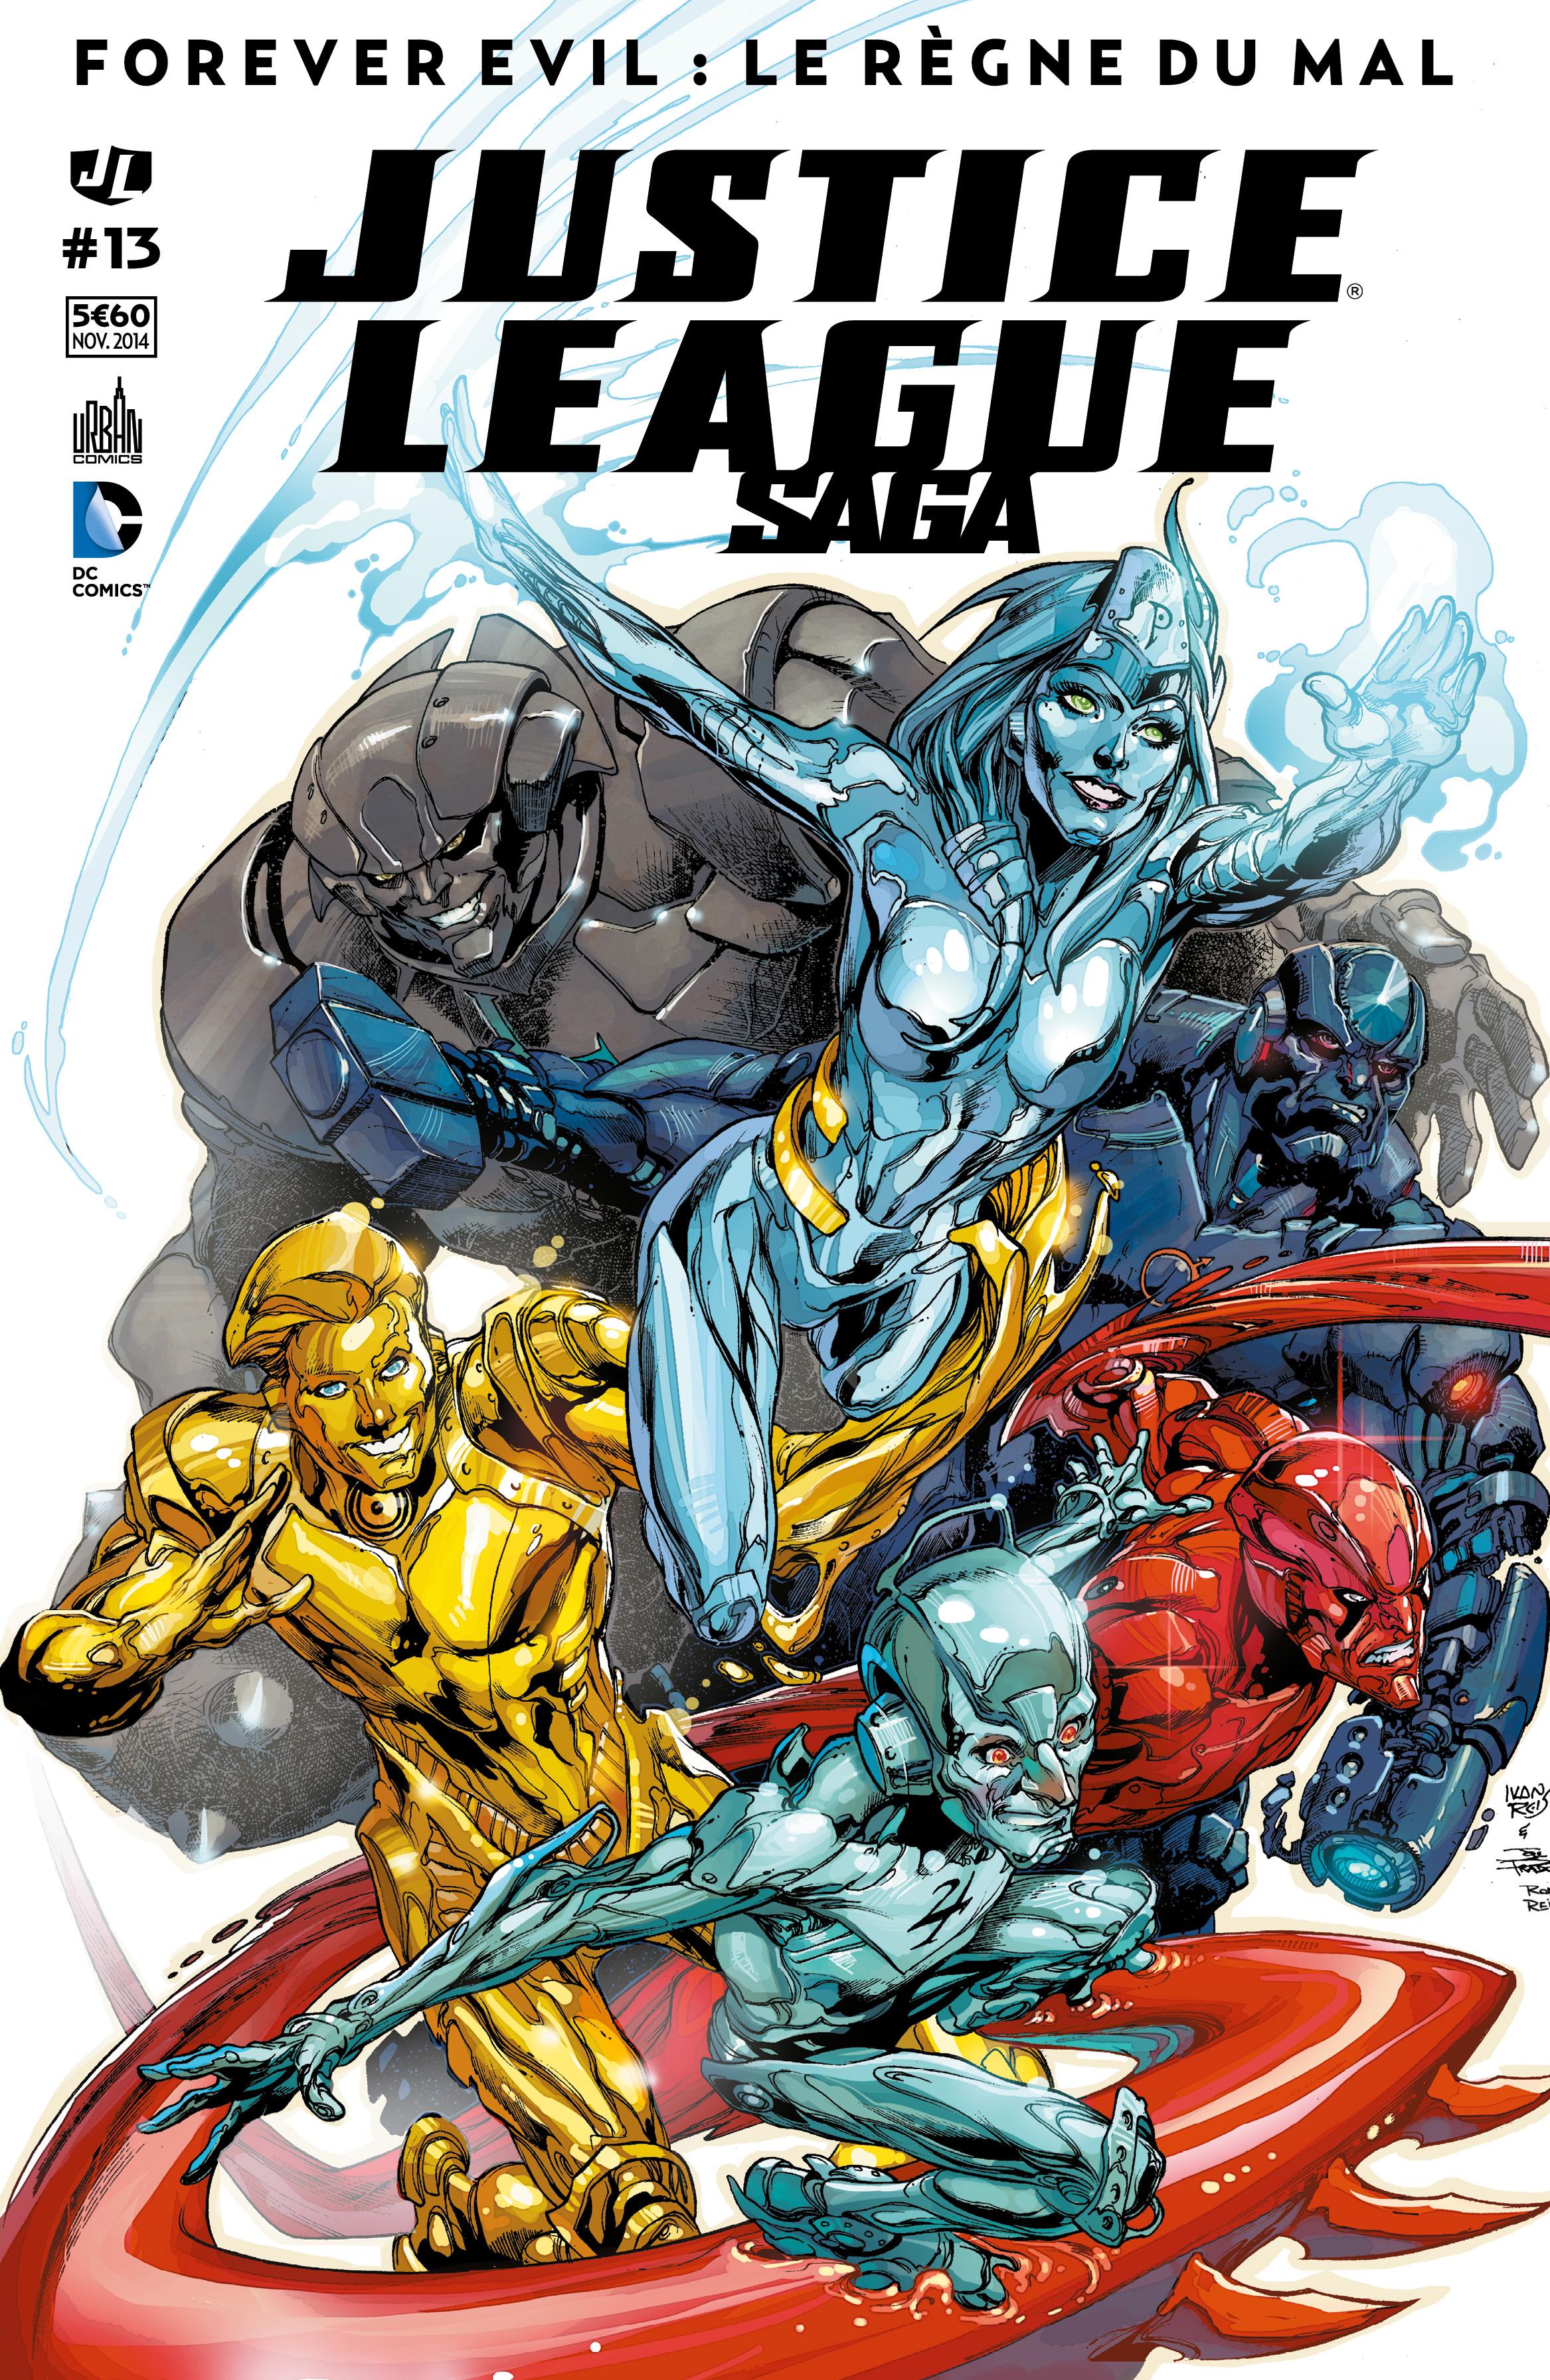 Justice League Saga 13